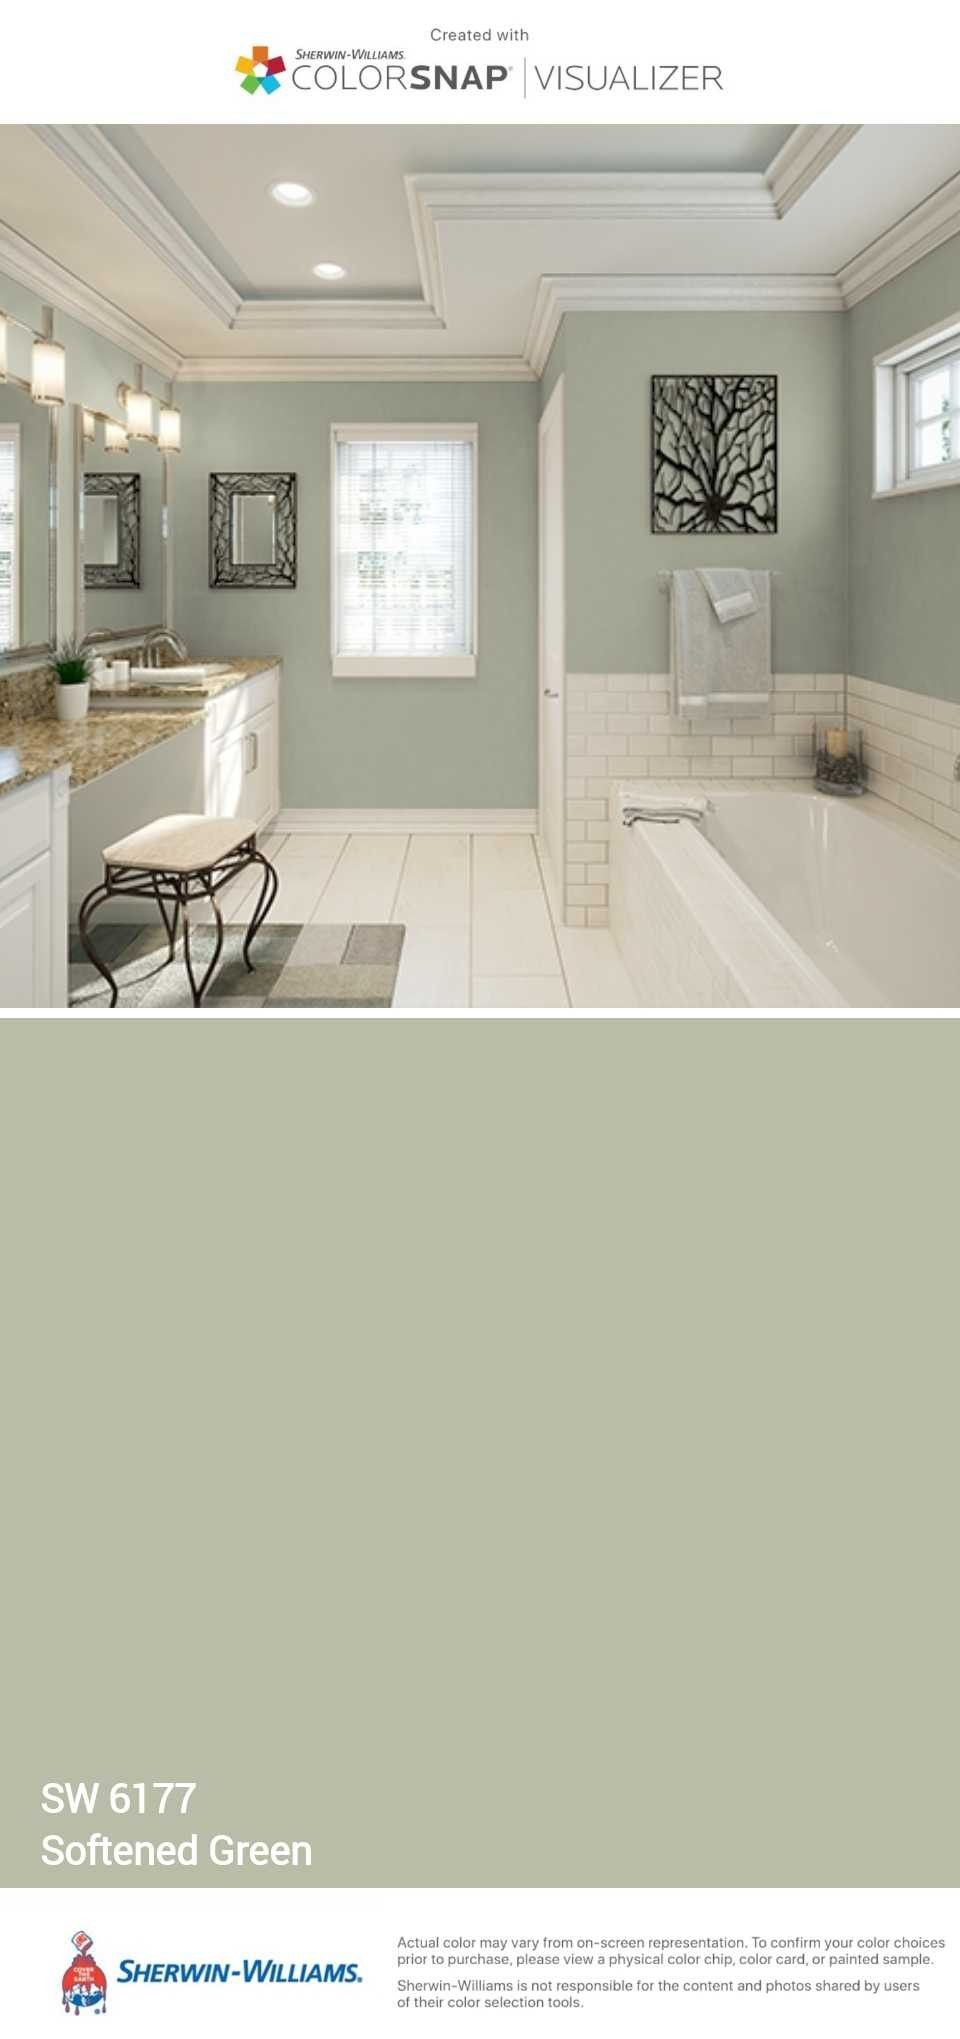 Softened Green Master Bedroom Or Bathroom Paint Colors For Home Small Bathroom Colors Bathroom Colors